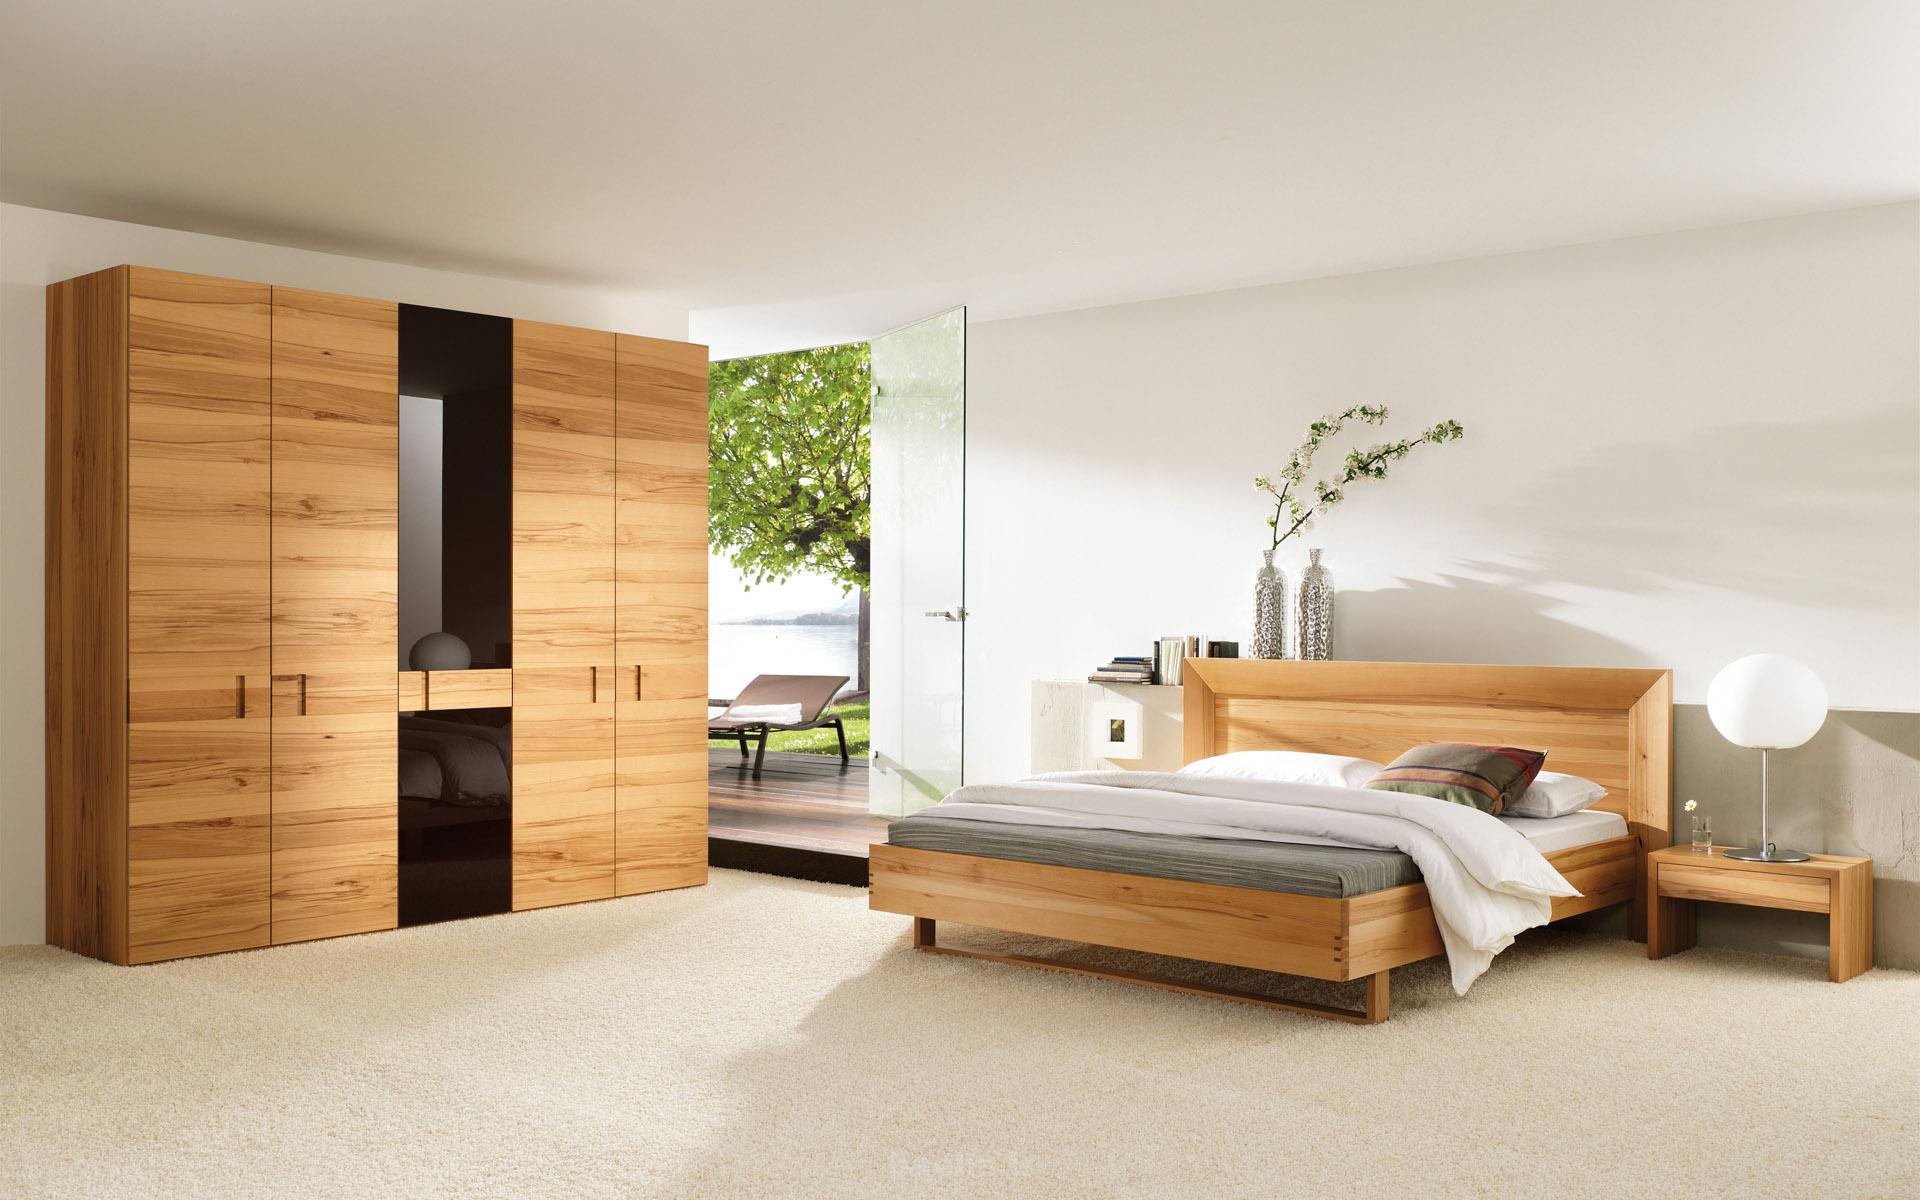 bedroom furniture designs 3 Bedroom Furniture Designs